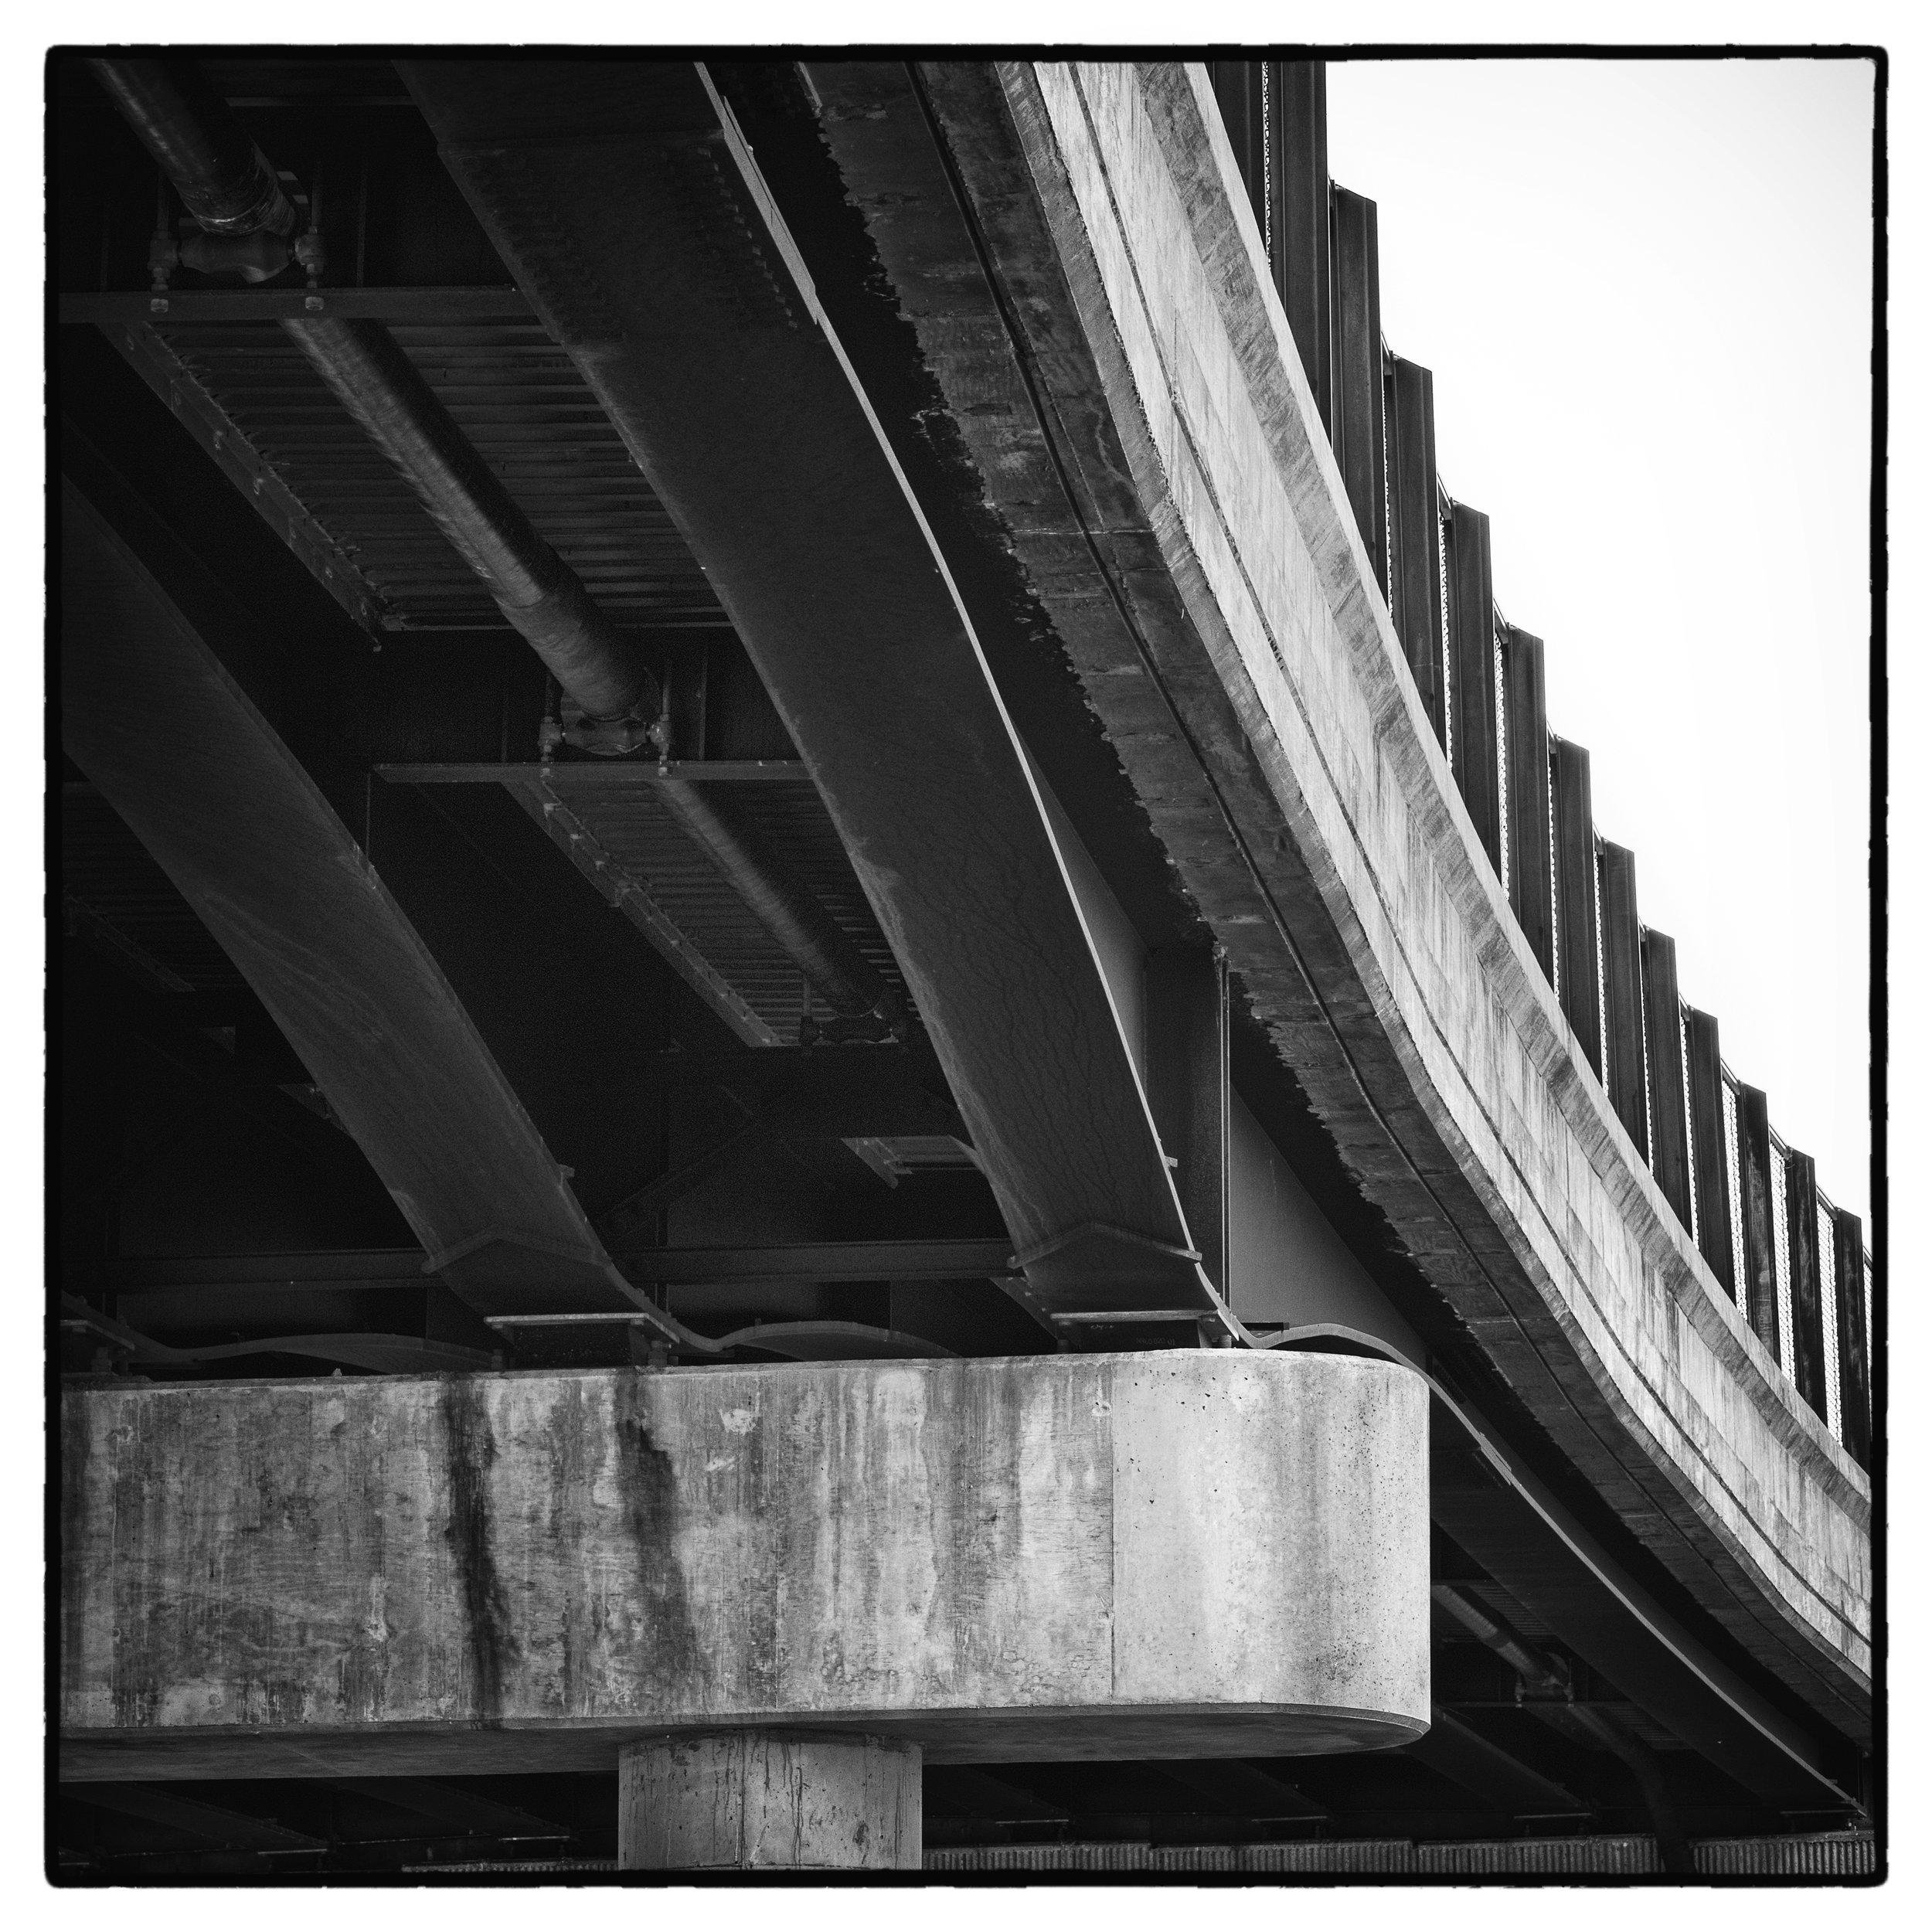 Durkin_Family_Bridge_V2_R2_2017_Jeff_Caplan.jpg